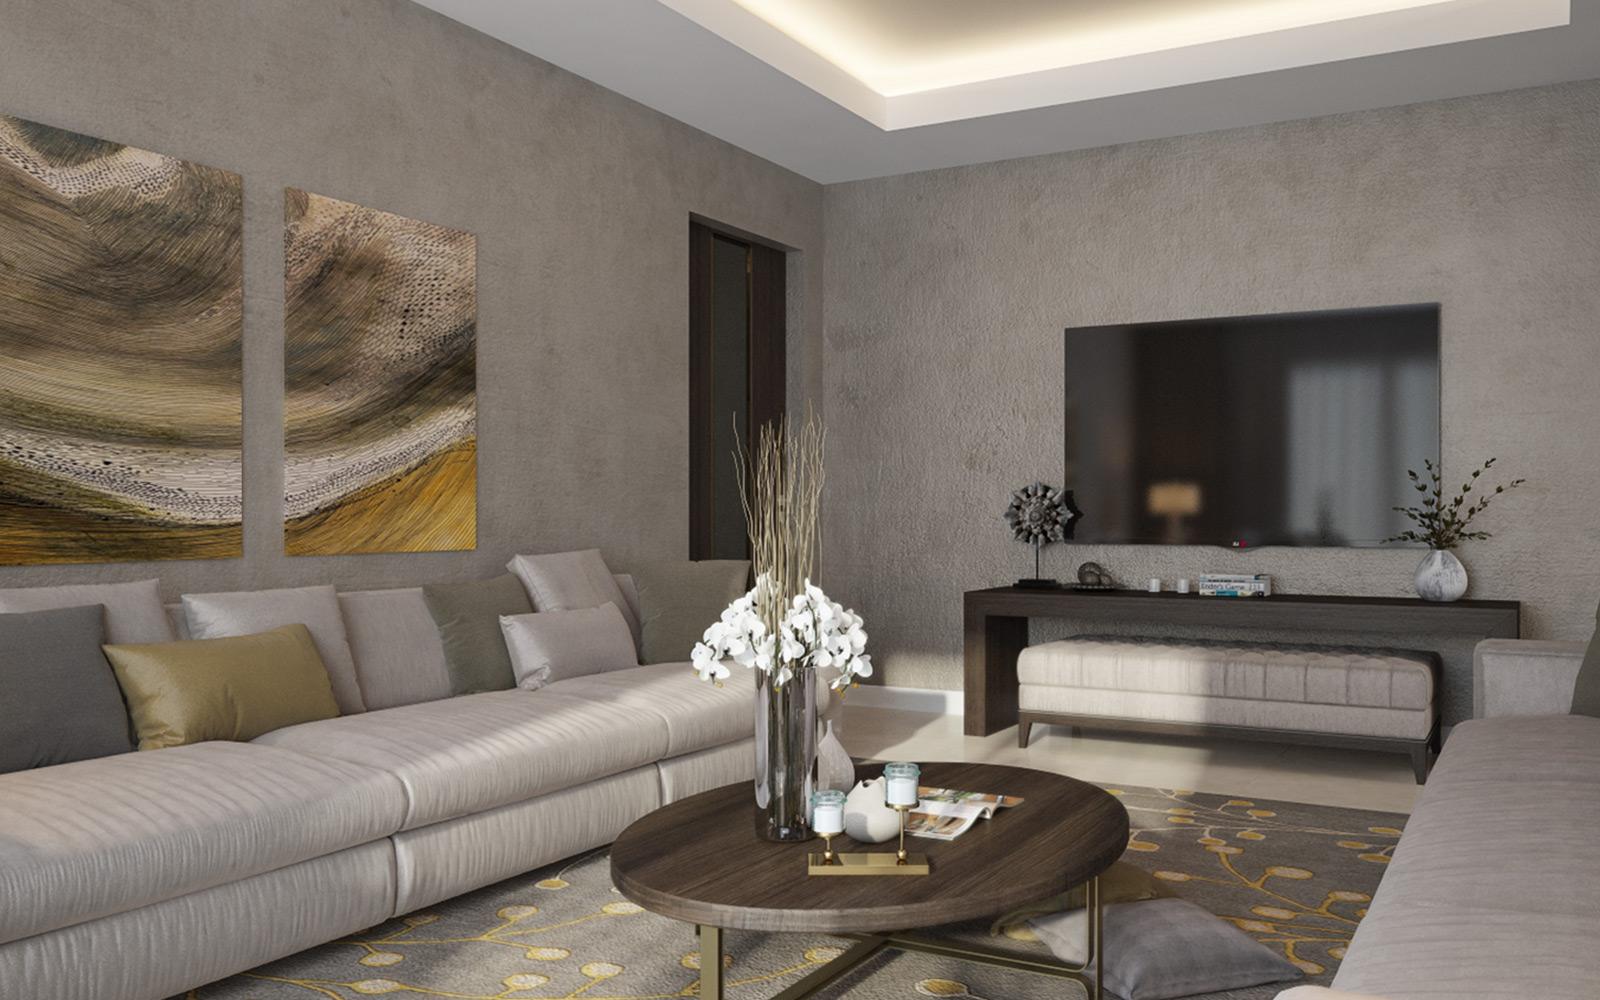 Vogue Design - Saudi Arabia Paleria Flats3